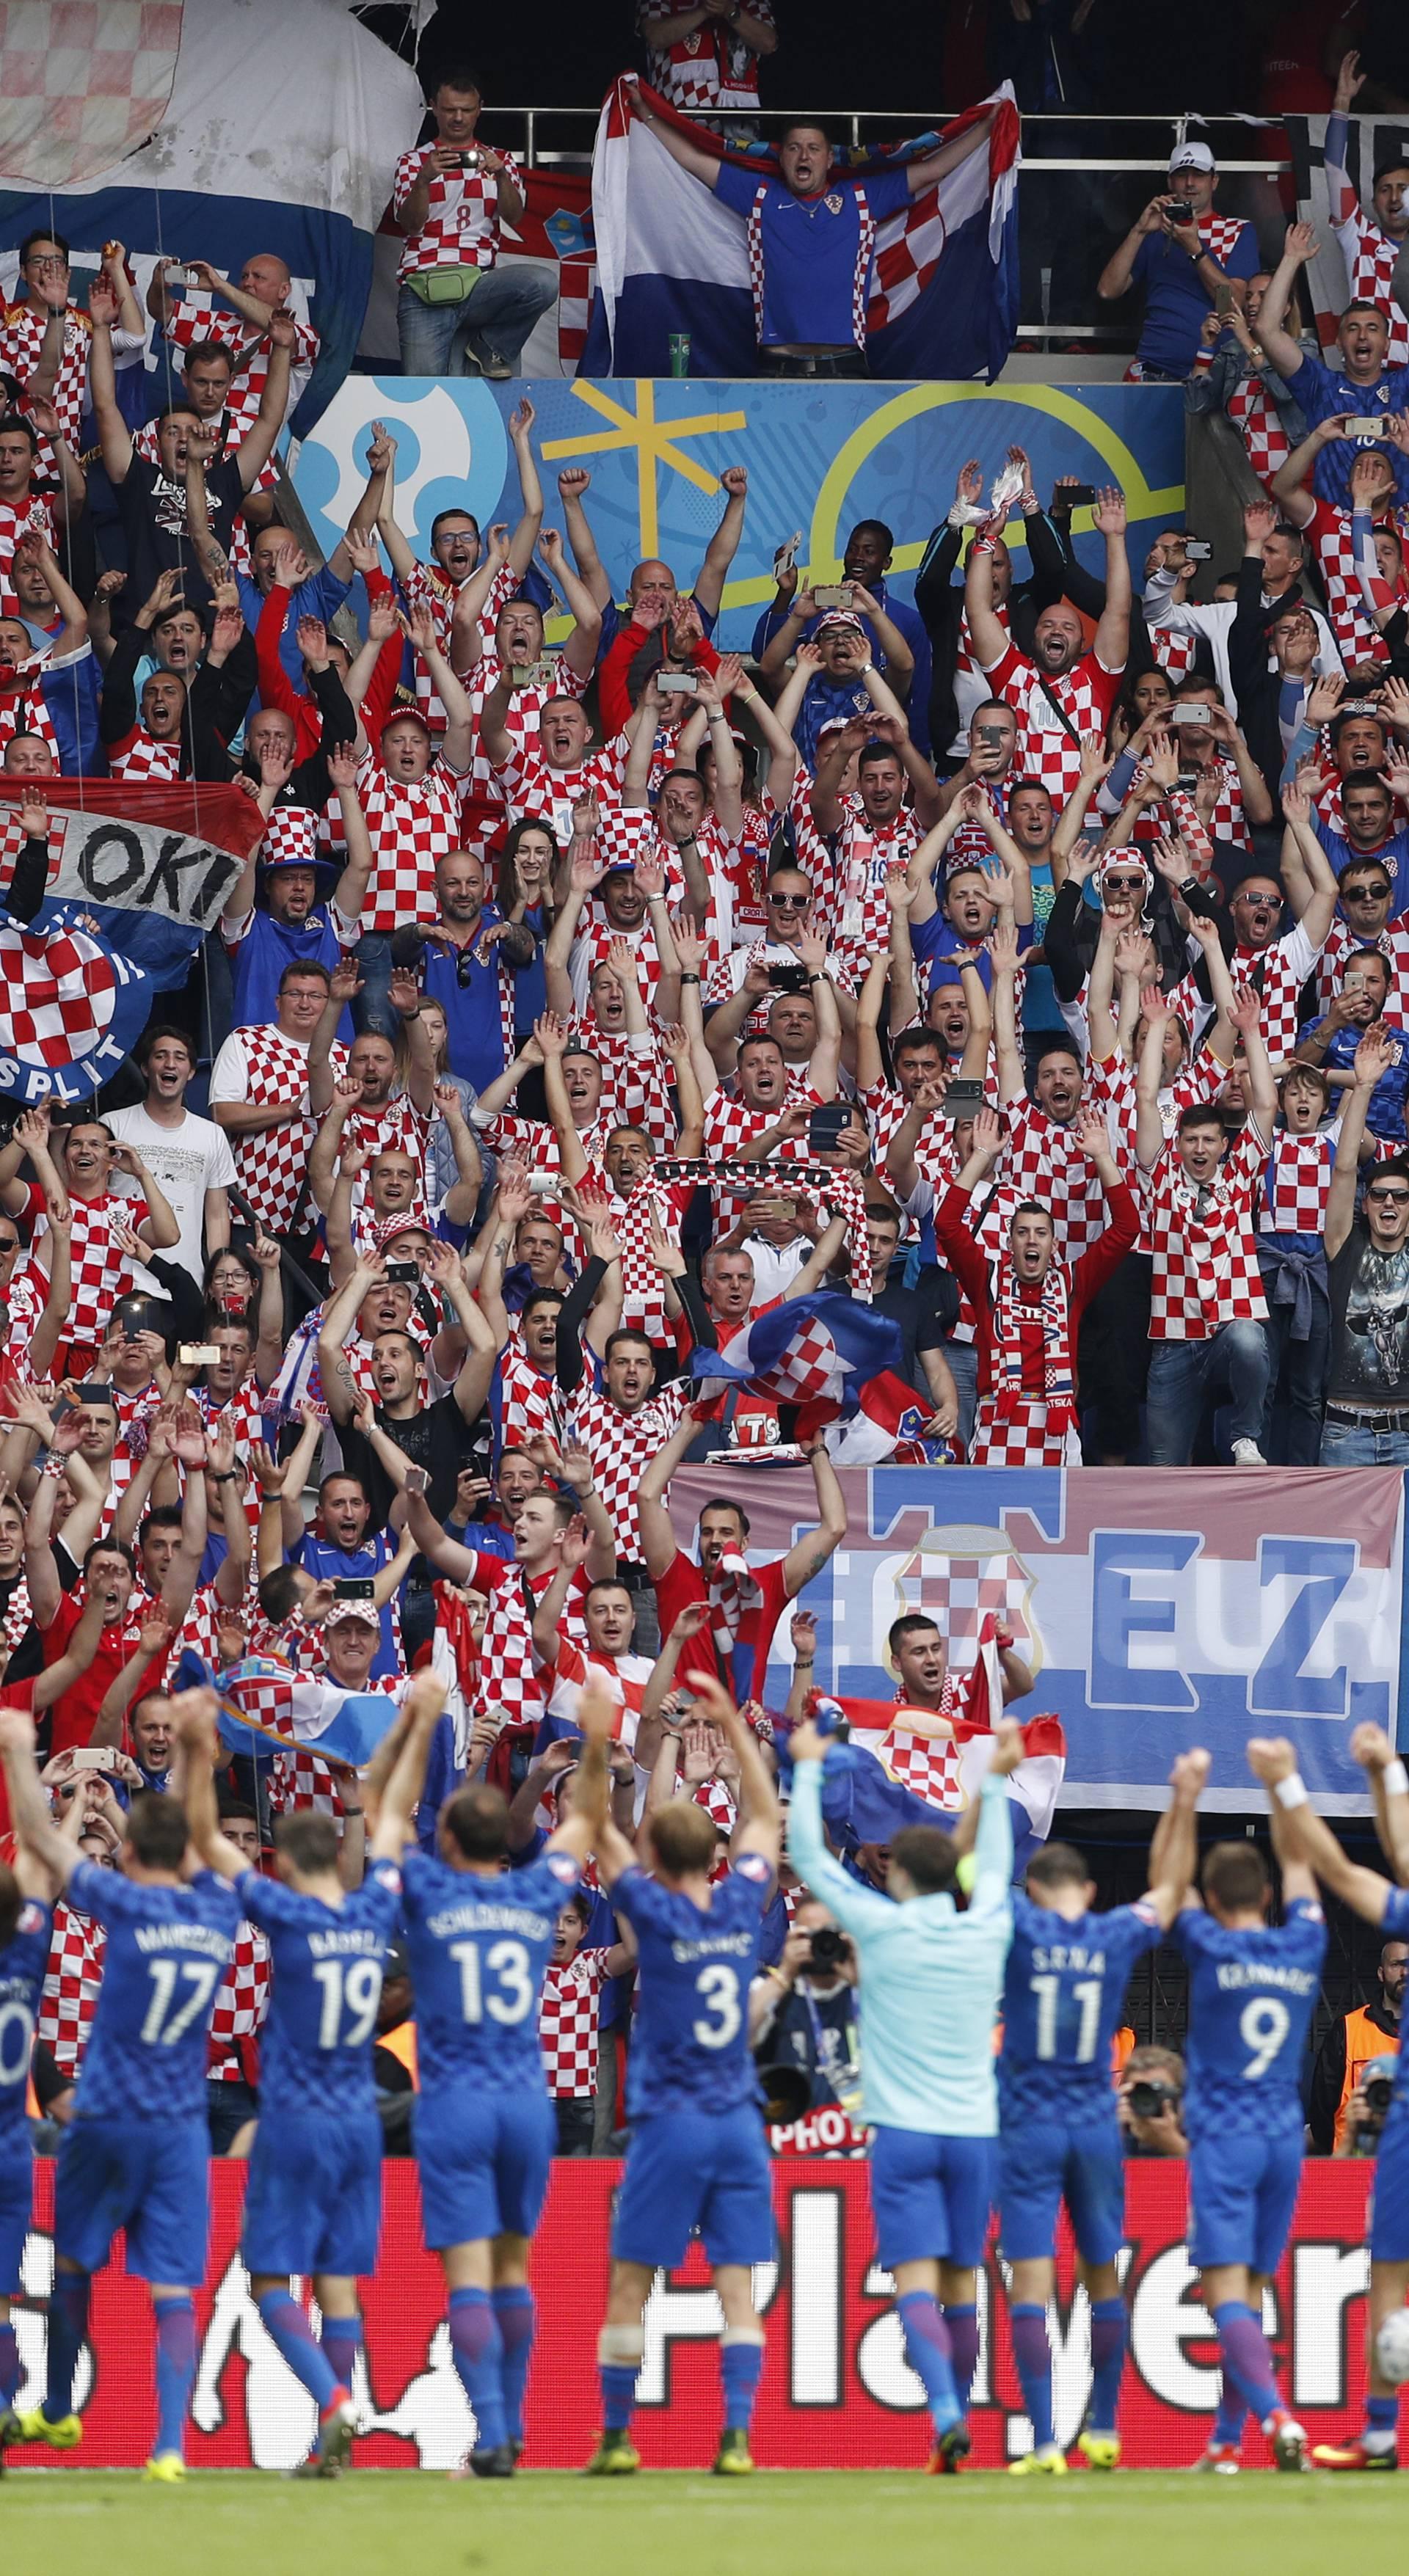 Turkey v Croatia - EURO 2016 - Group D